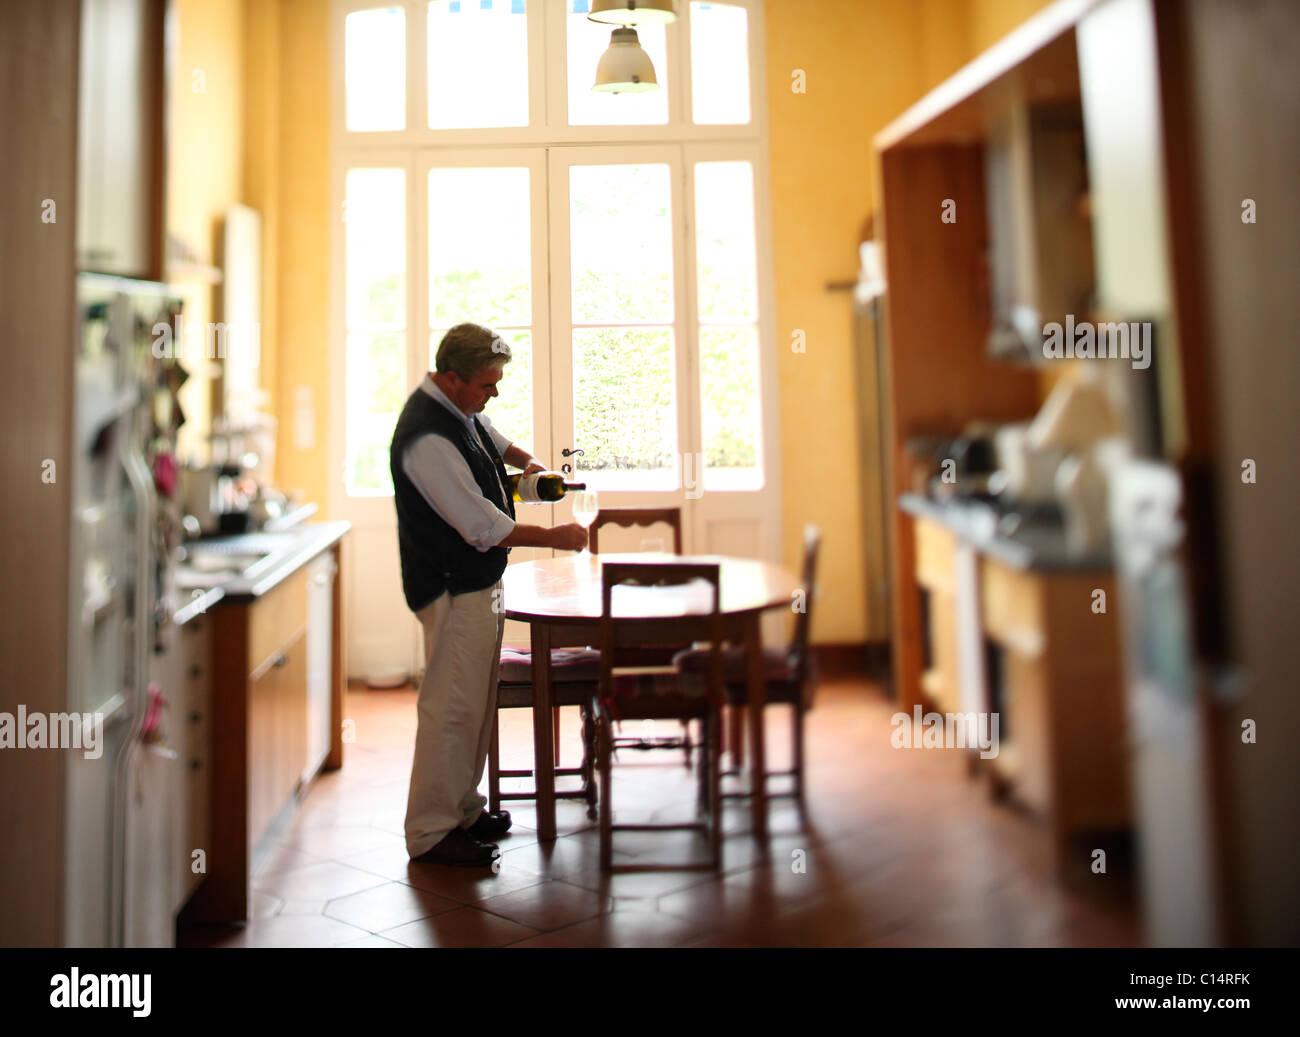 El hombre servir vino Imagen De Stock